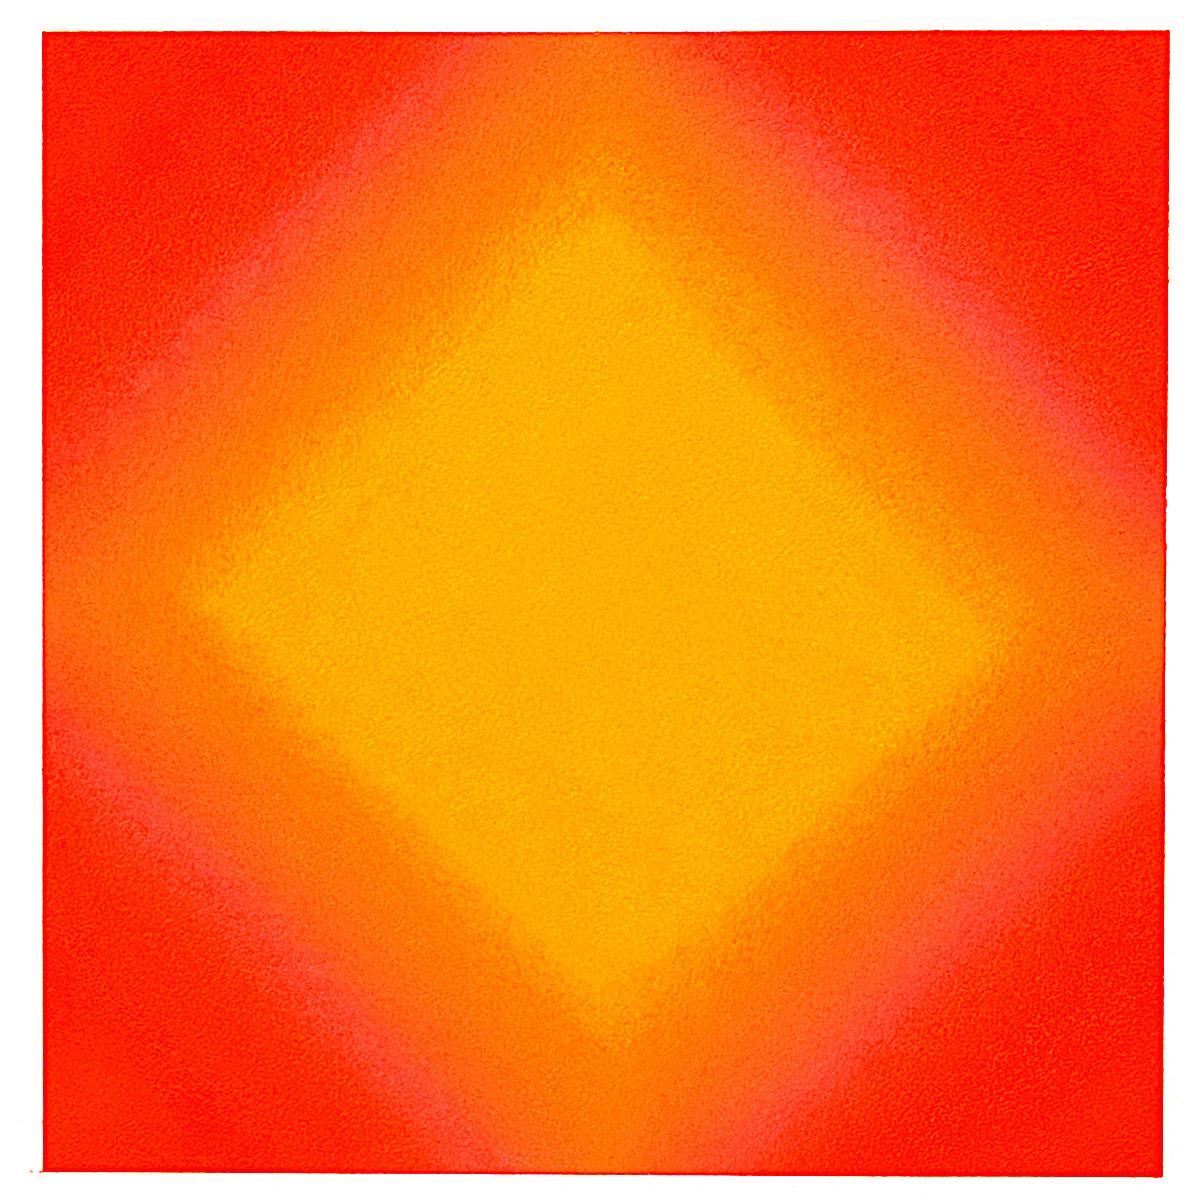 Warm-Light Yellow-Orange, Diamond, Warm-Light Cool-Light Series, 2012, pastel on paper, image: 14 x 14 in. (36 x 36 cm.), sheet: 30 x 22 in. (76 x 56 cm.)